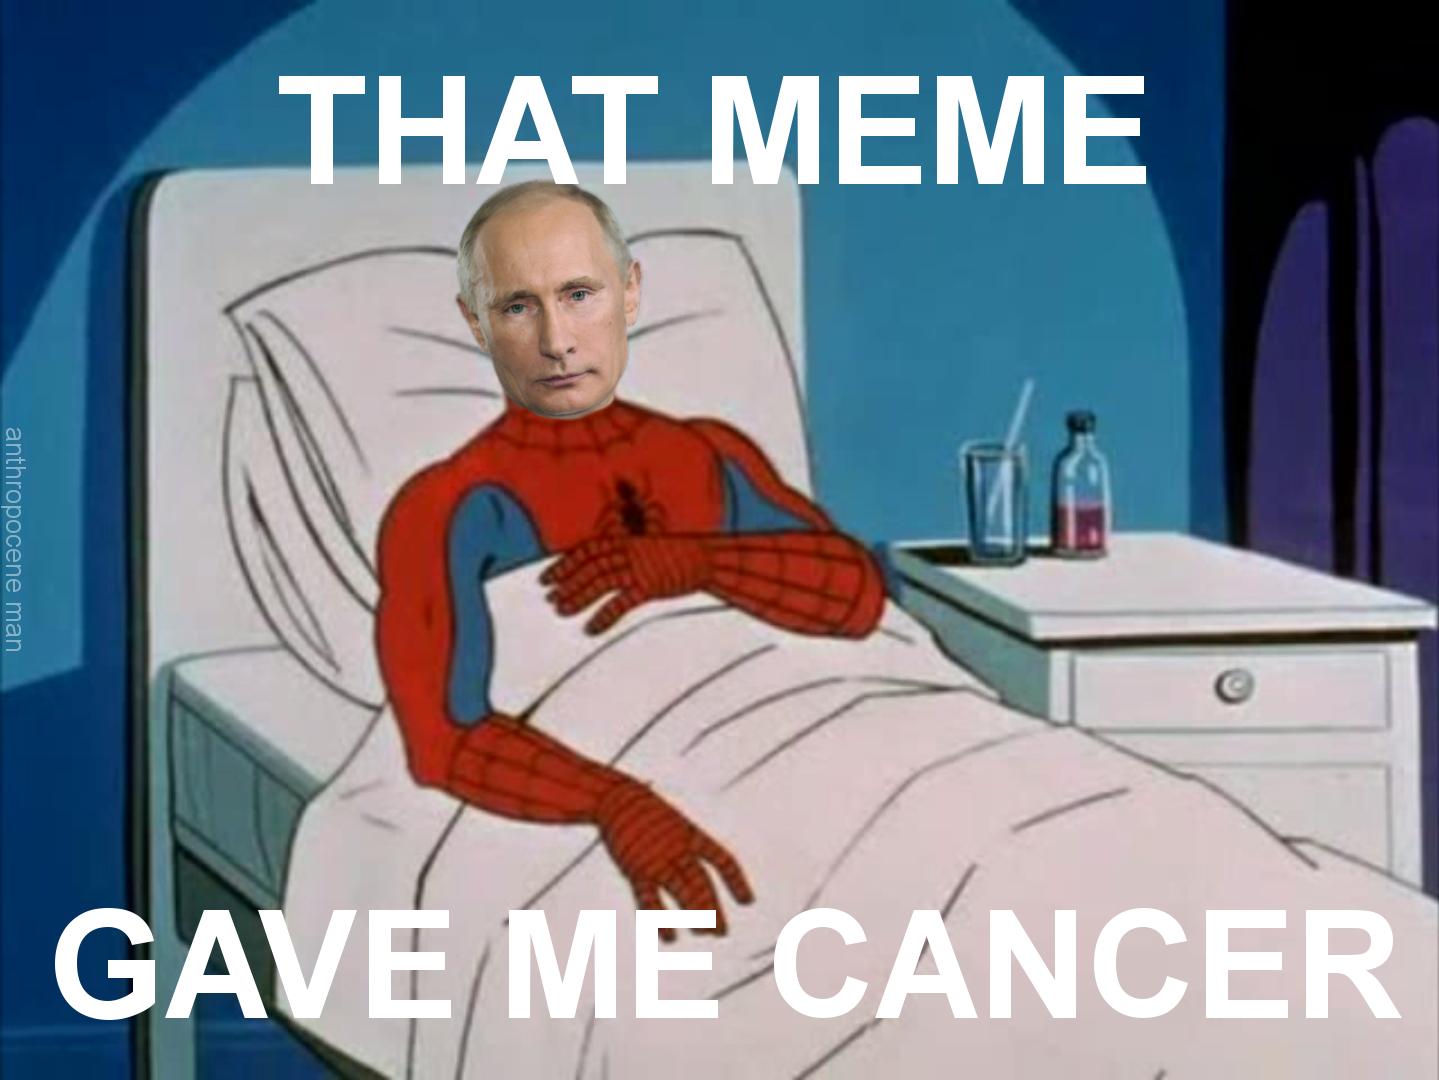 That Meme Gave Me Cancer Cancer Meme